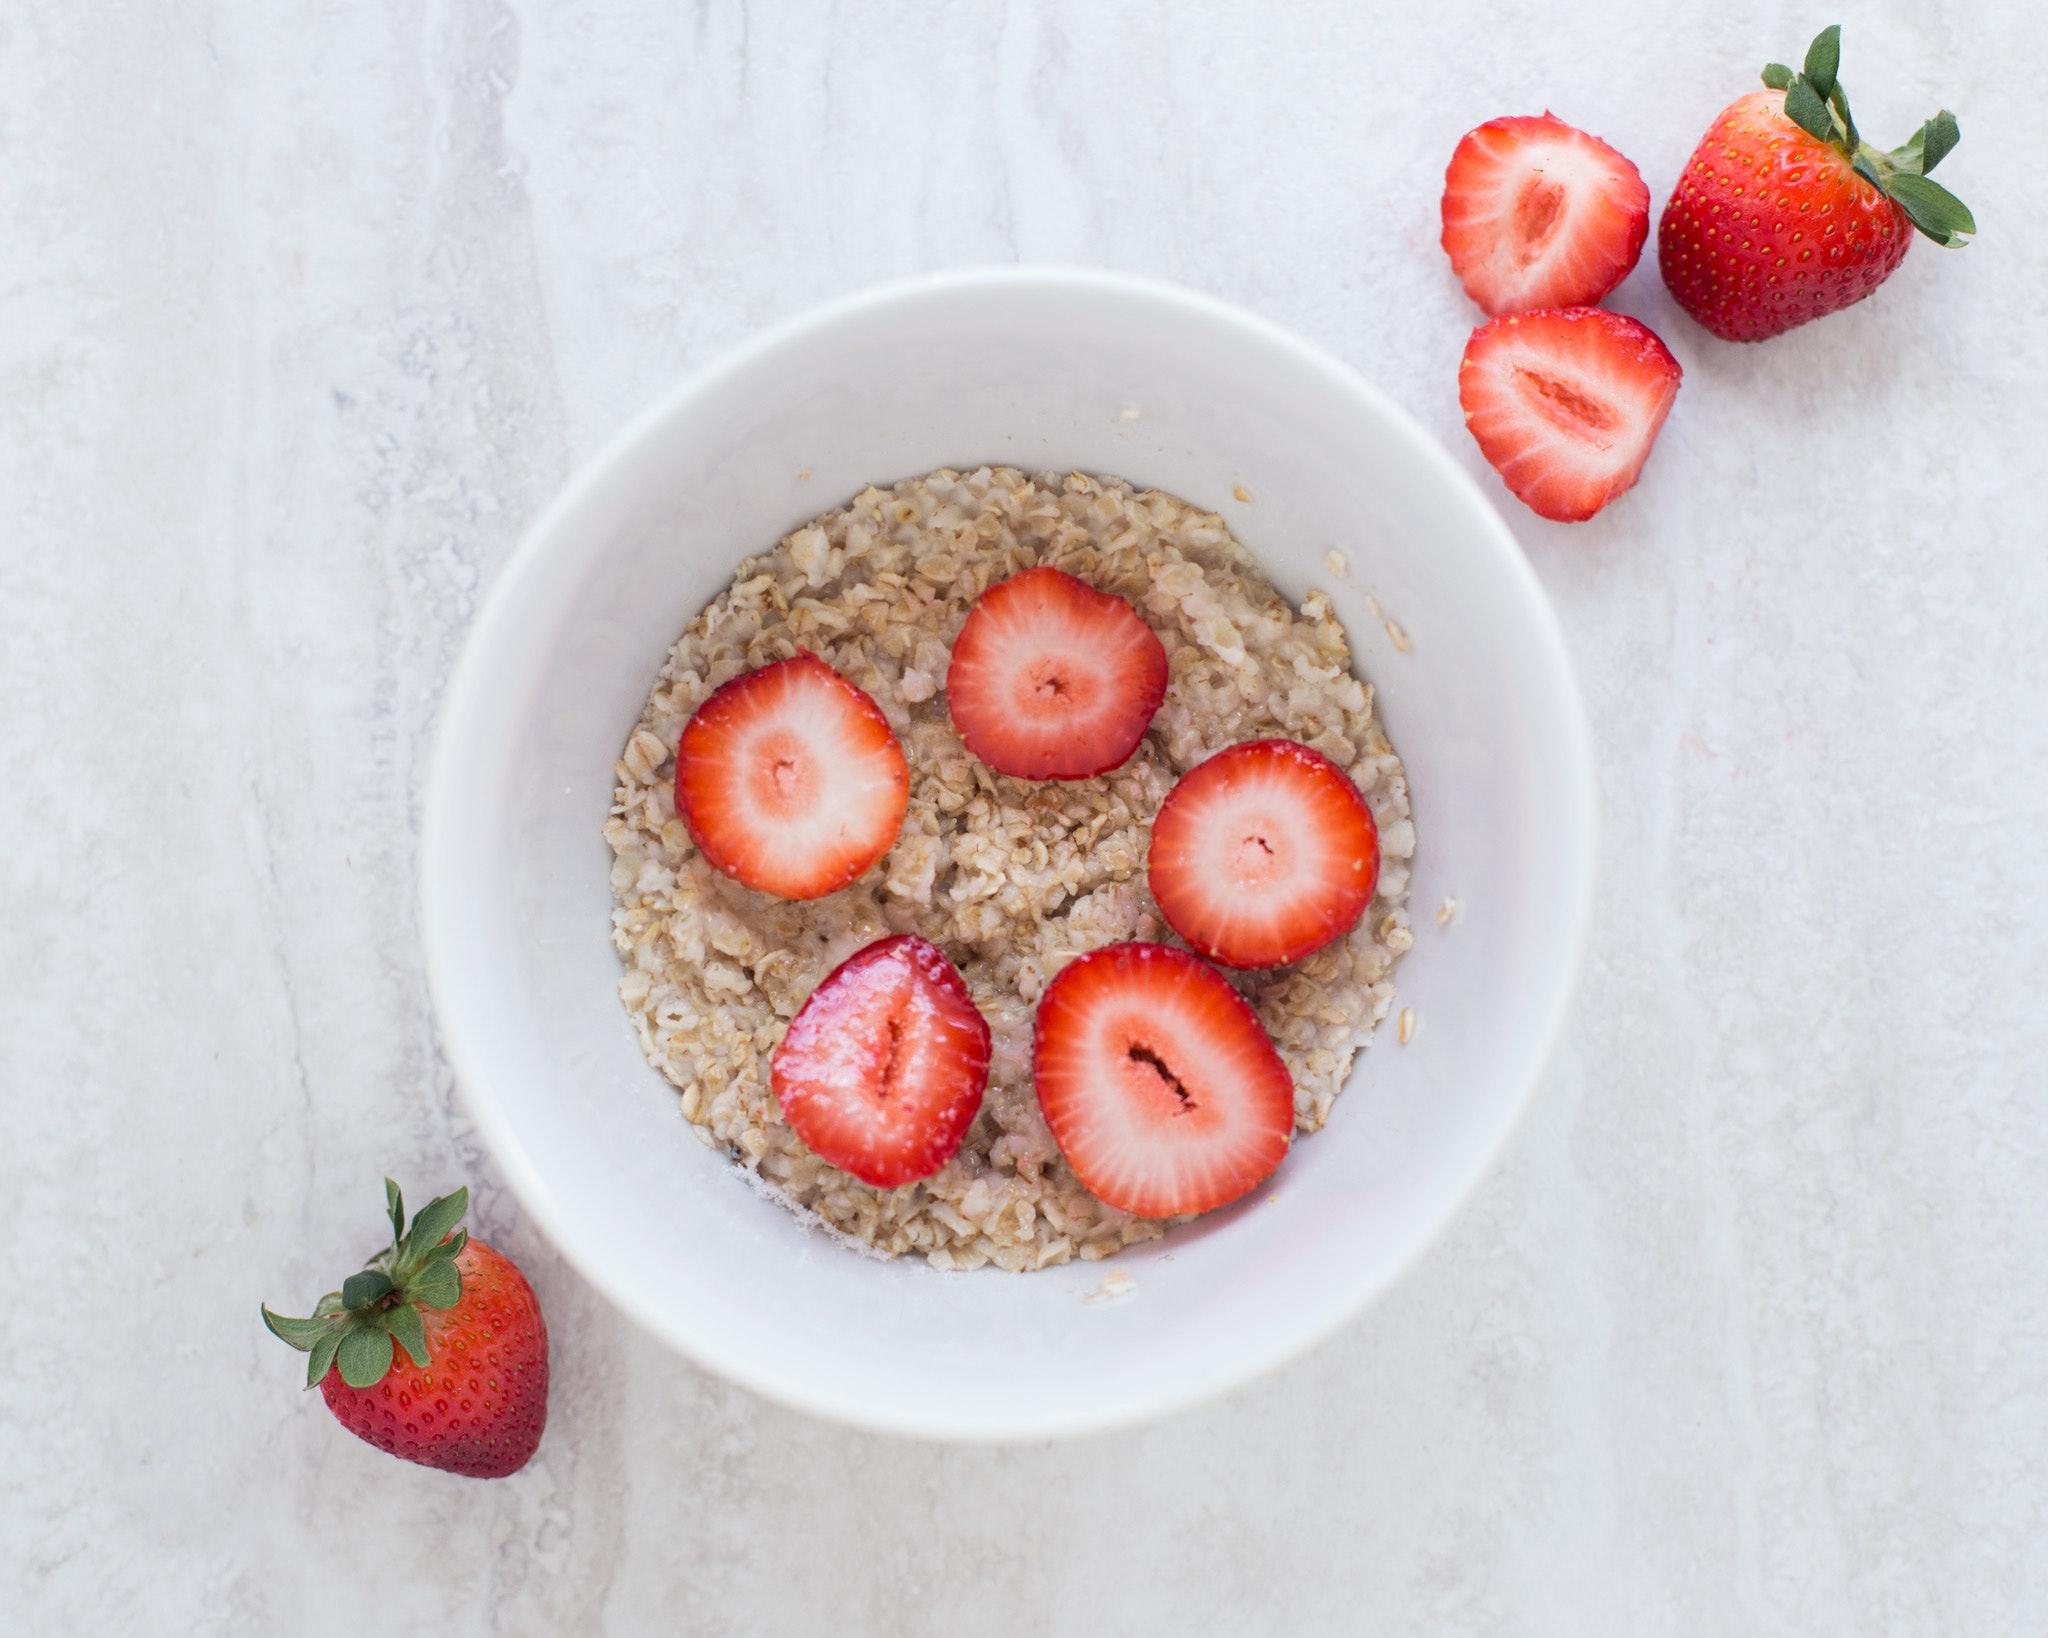 Strawberry on table top near white ceramic bowl photo